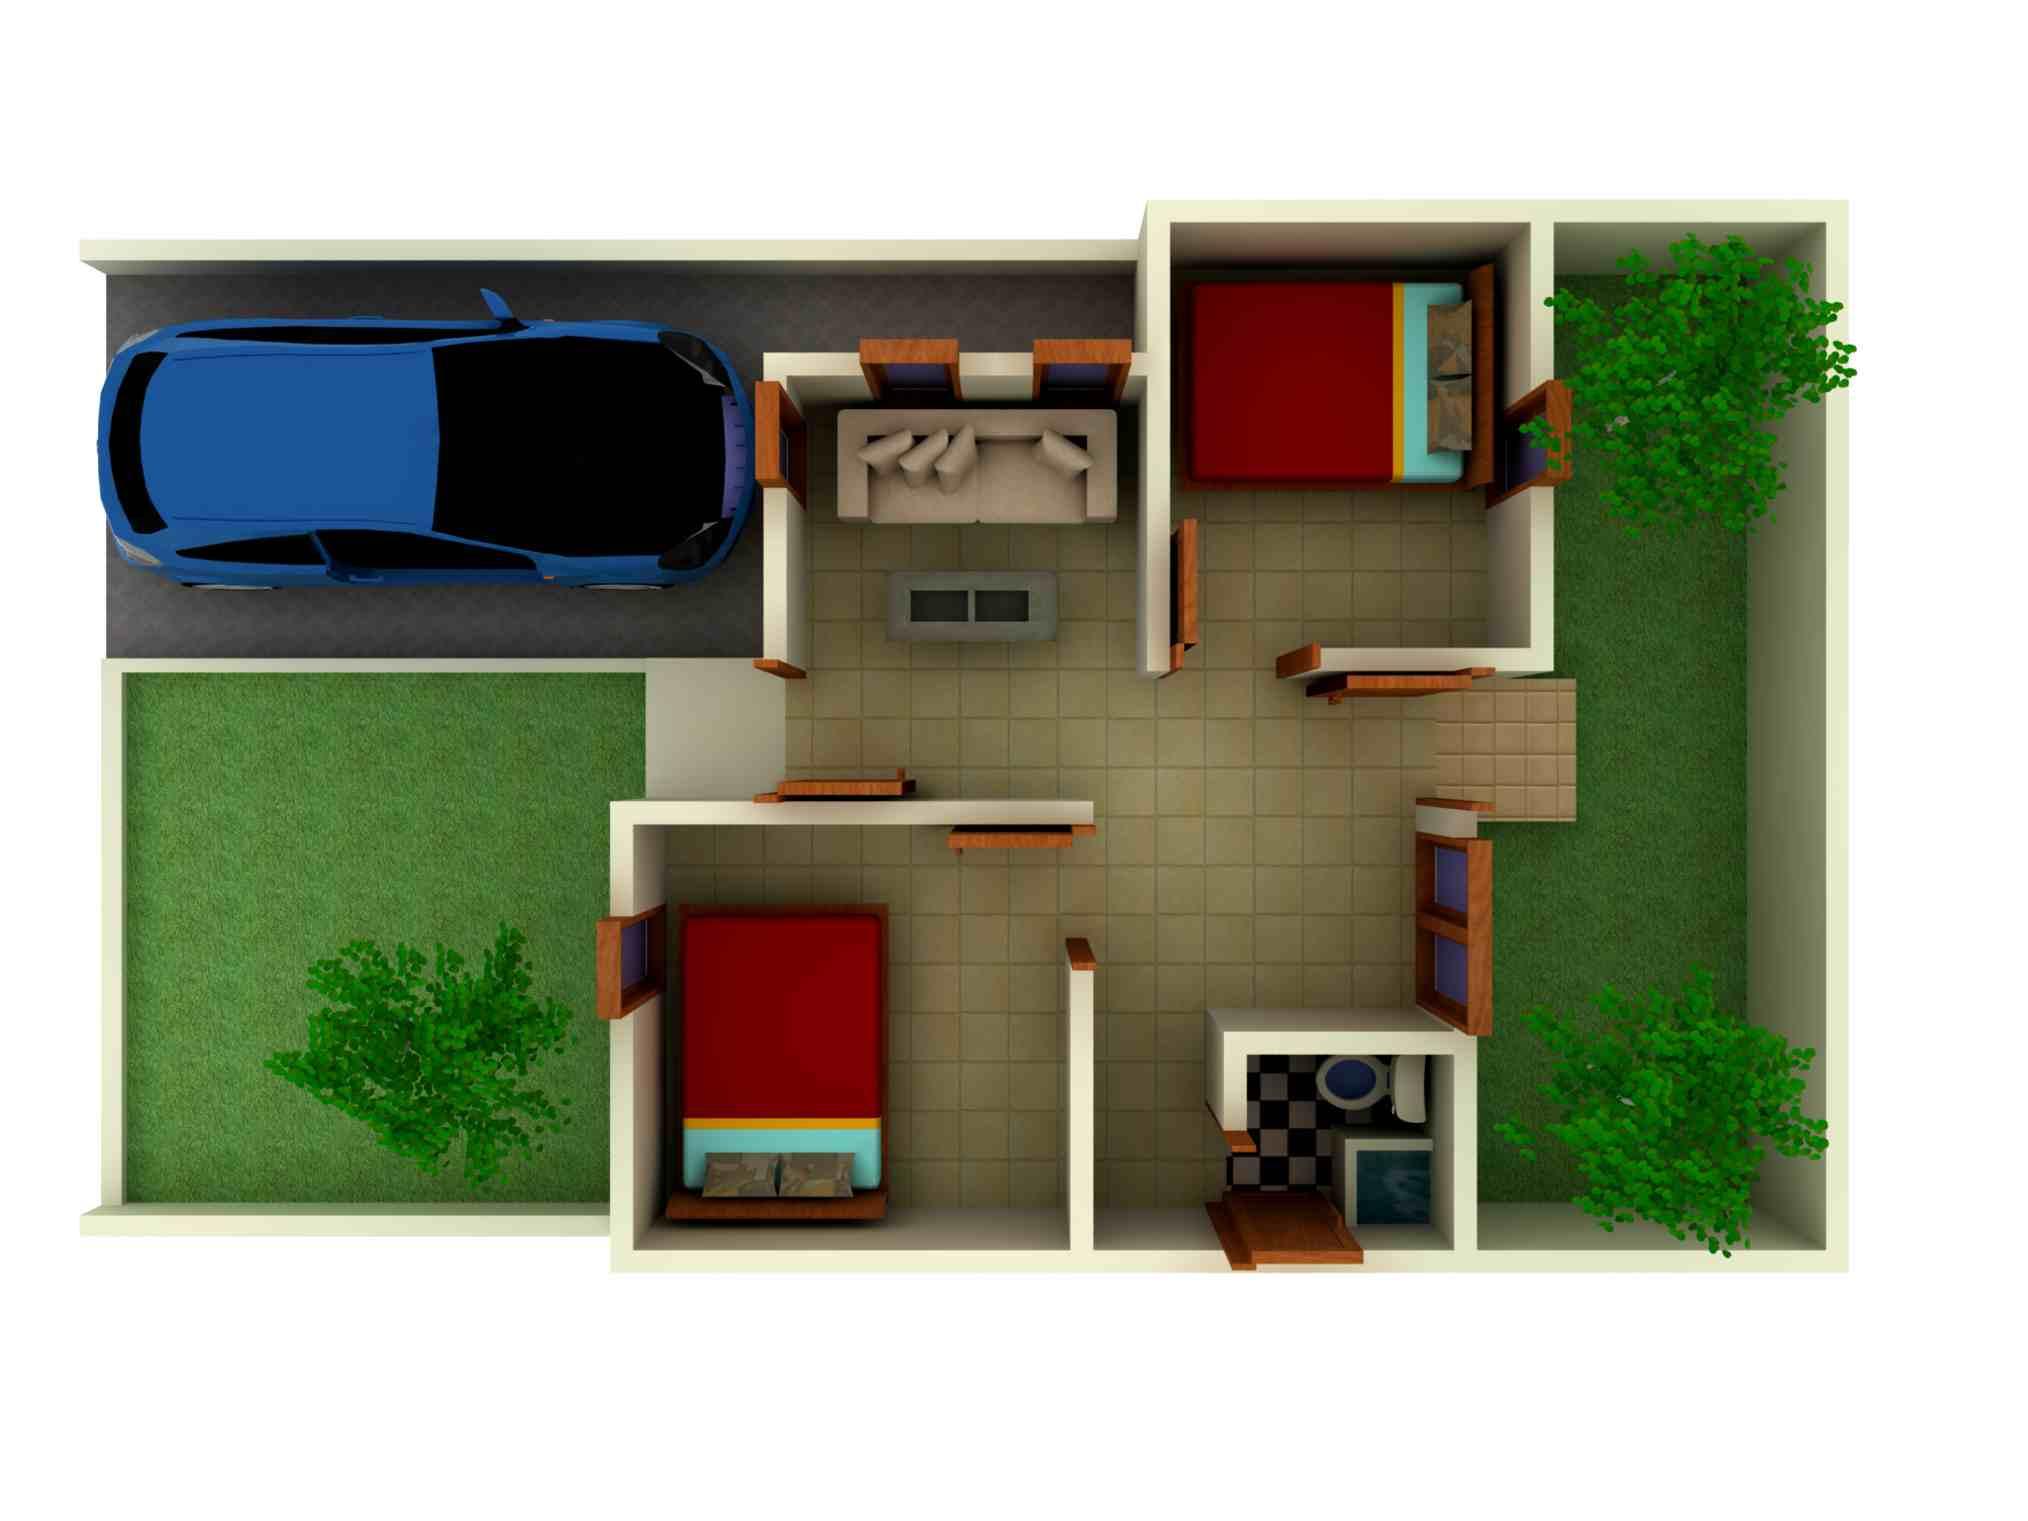 Desain Interior Rumah Tipe 36 1 Lantai | Desain Interior Rumah Minimalis Type 36 1 Lantai